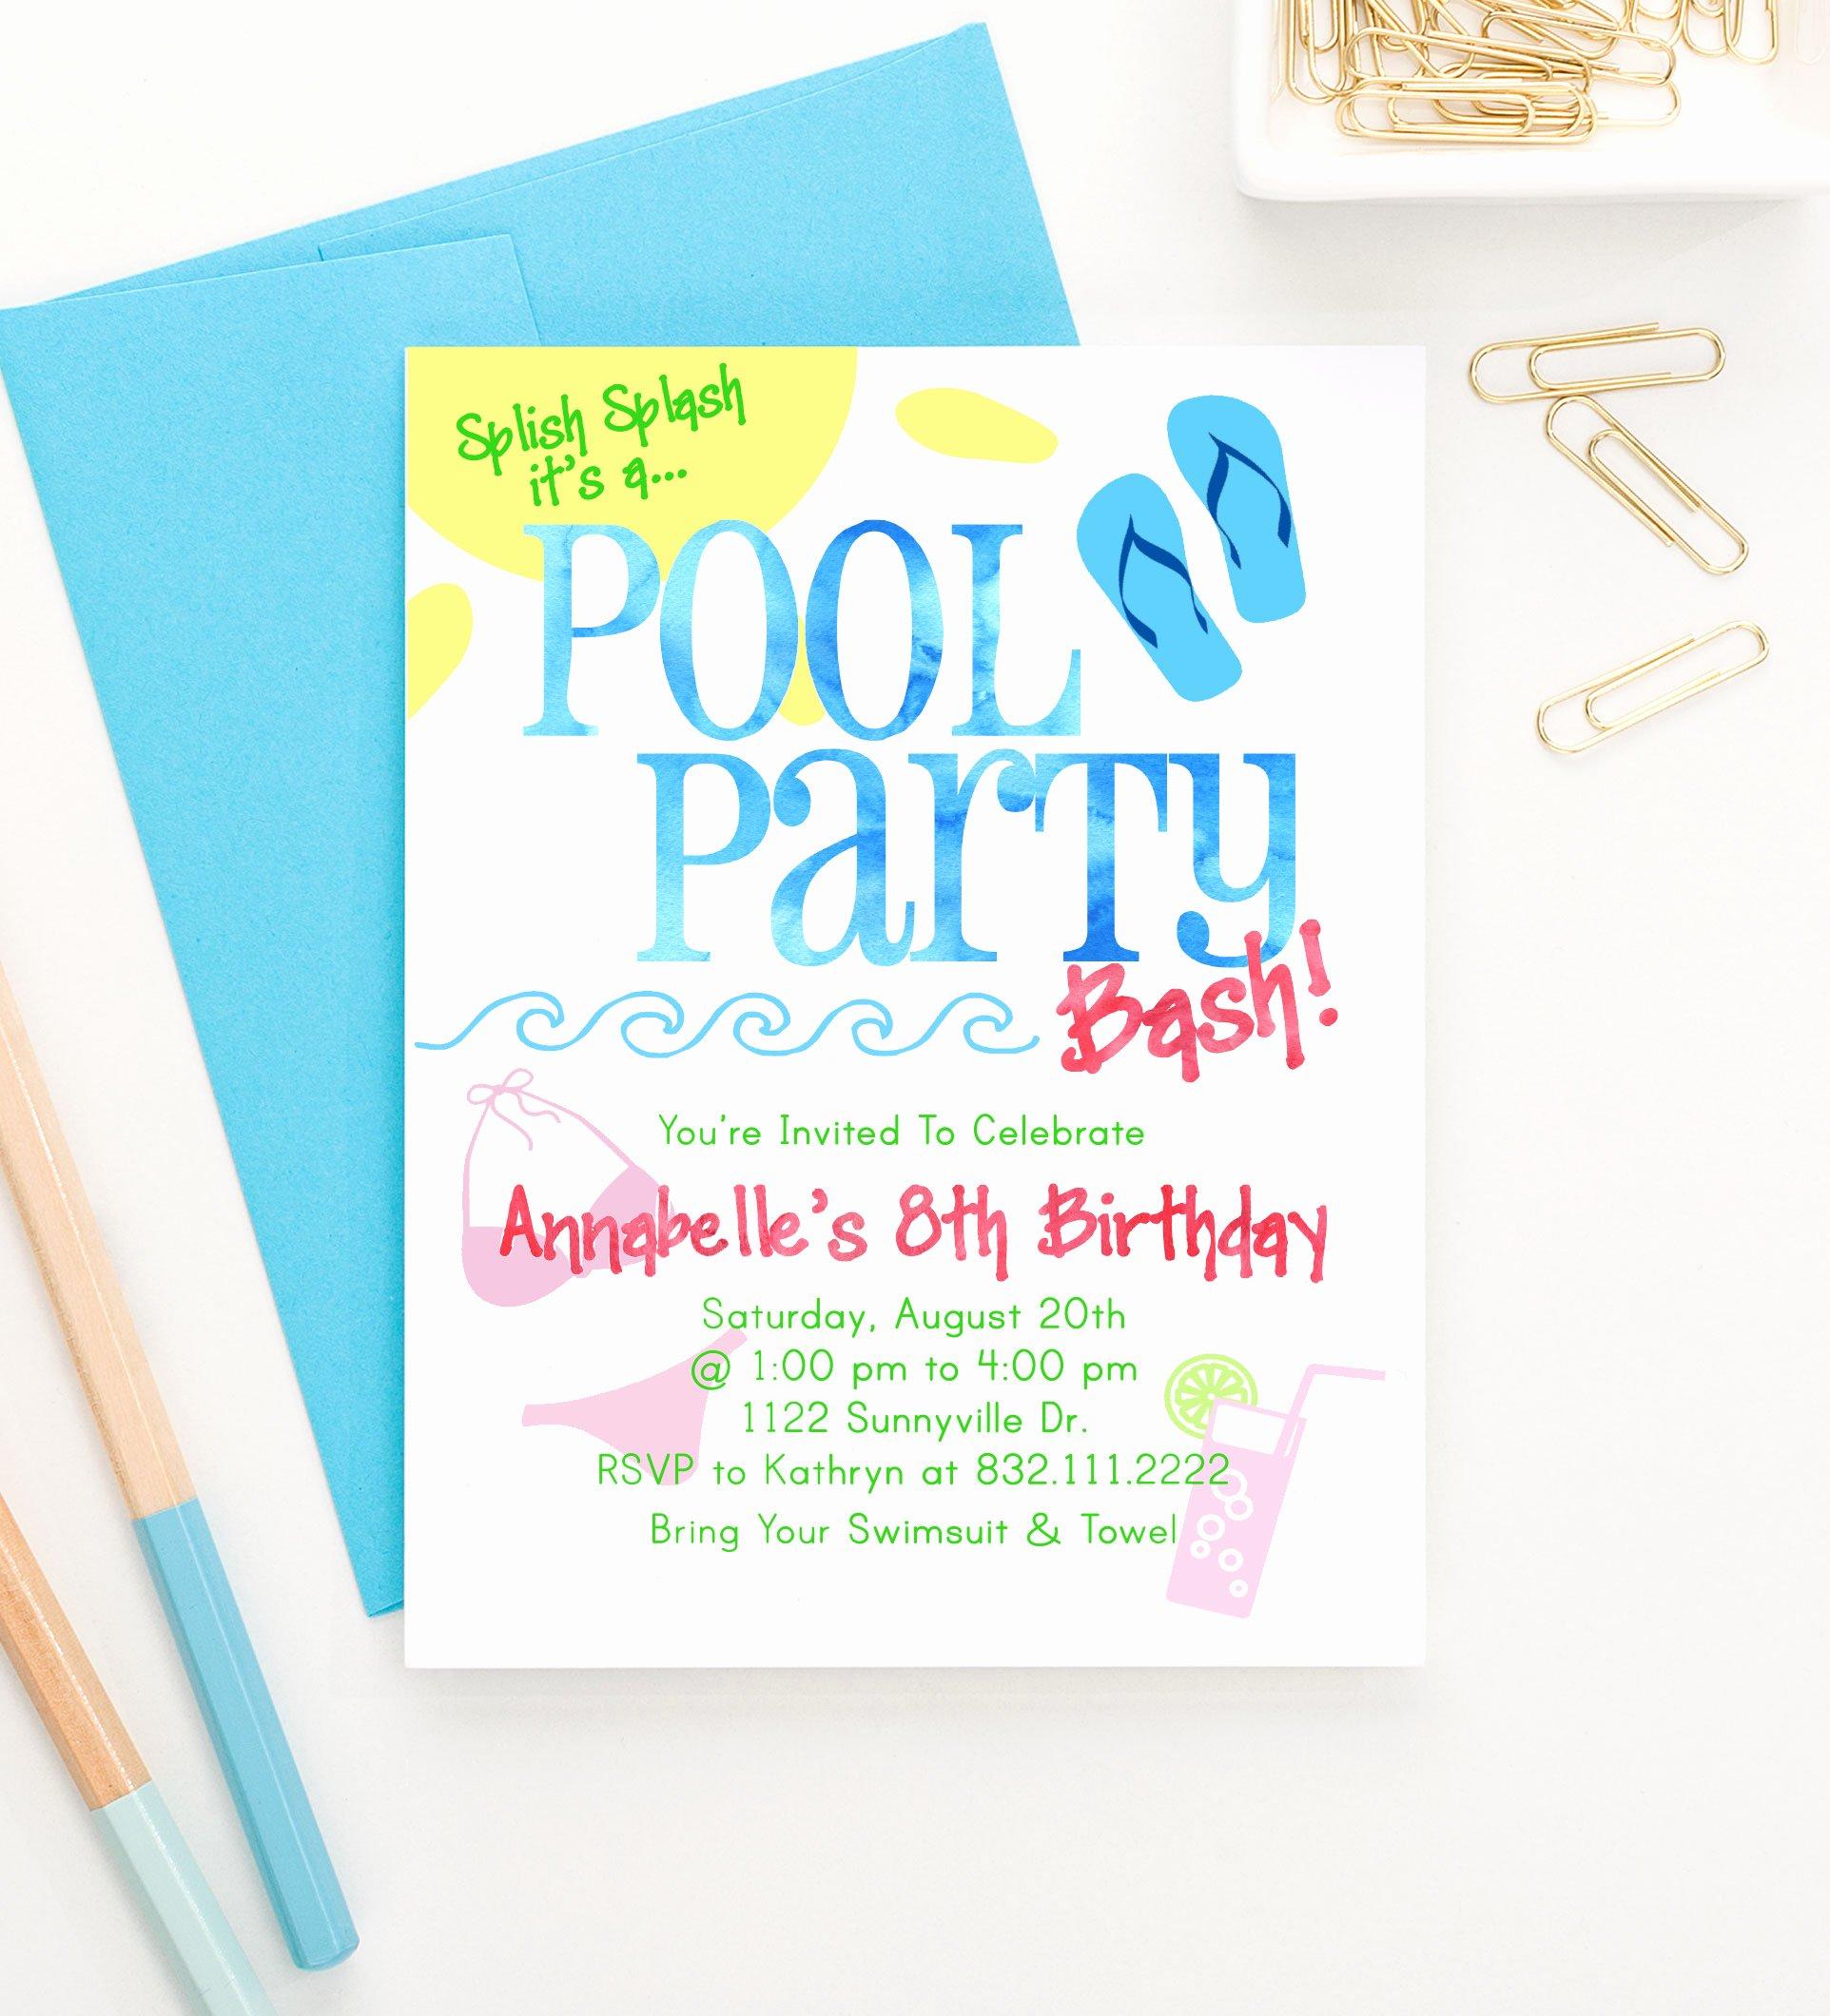 Summer Pool Party Invitations Elegant Pool Party Birthday Invitations Summer Birthday Party